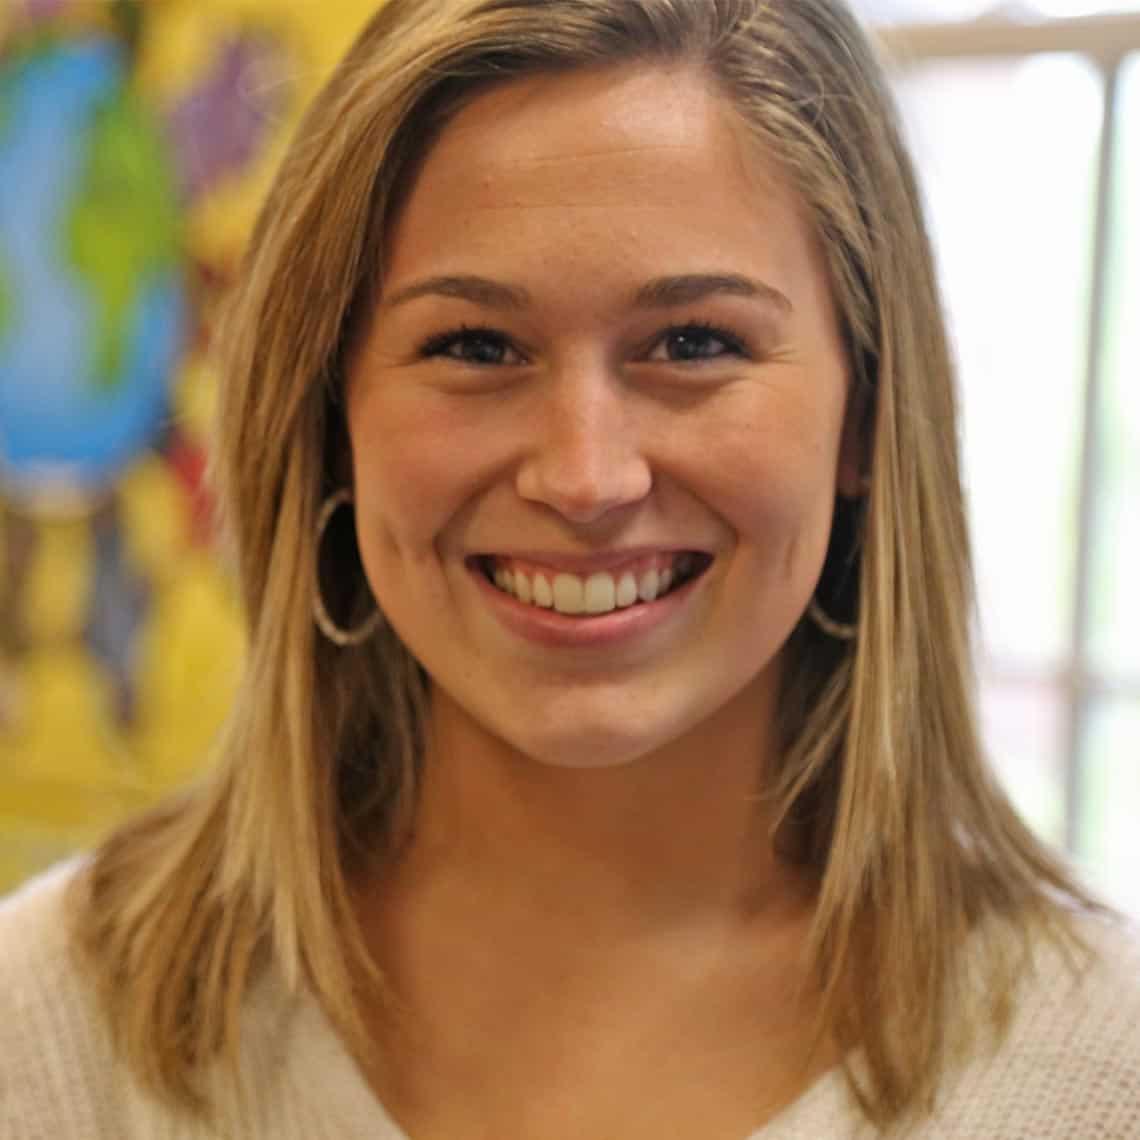 Paige Ingalls '16